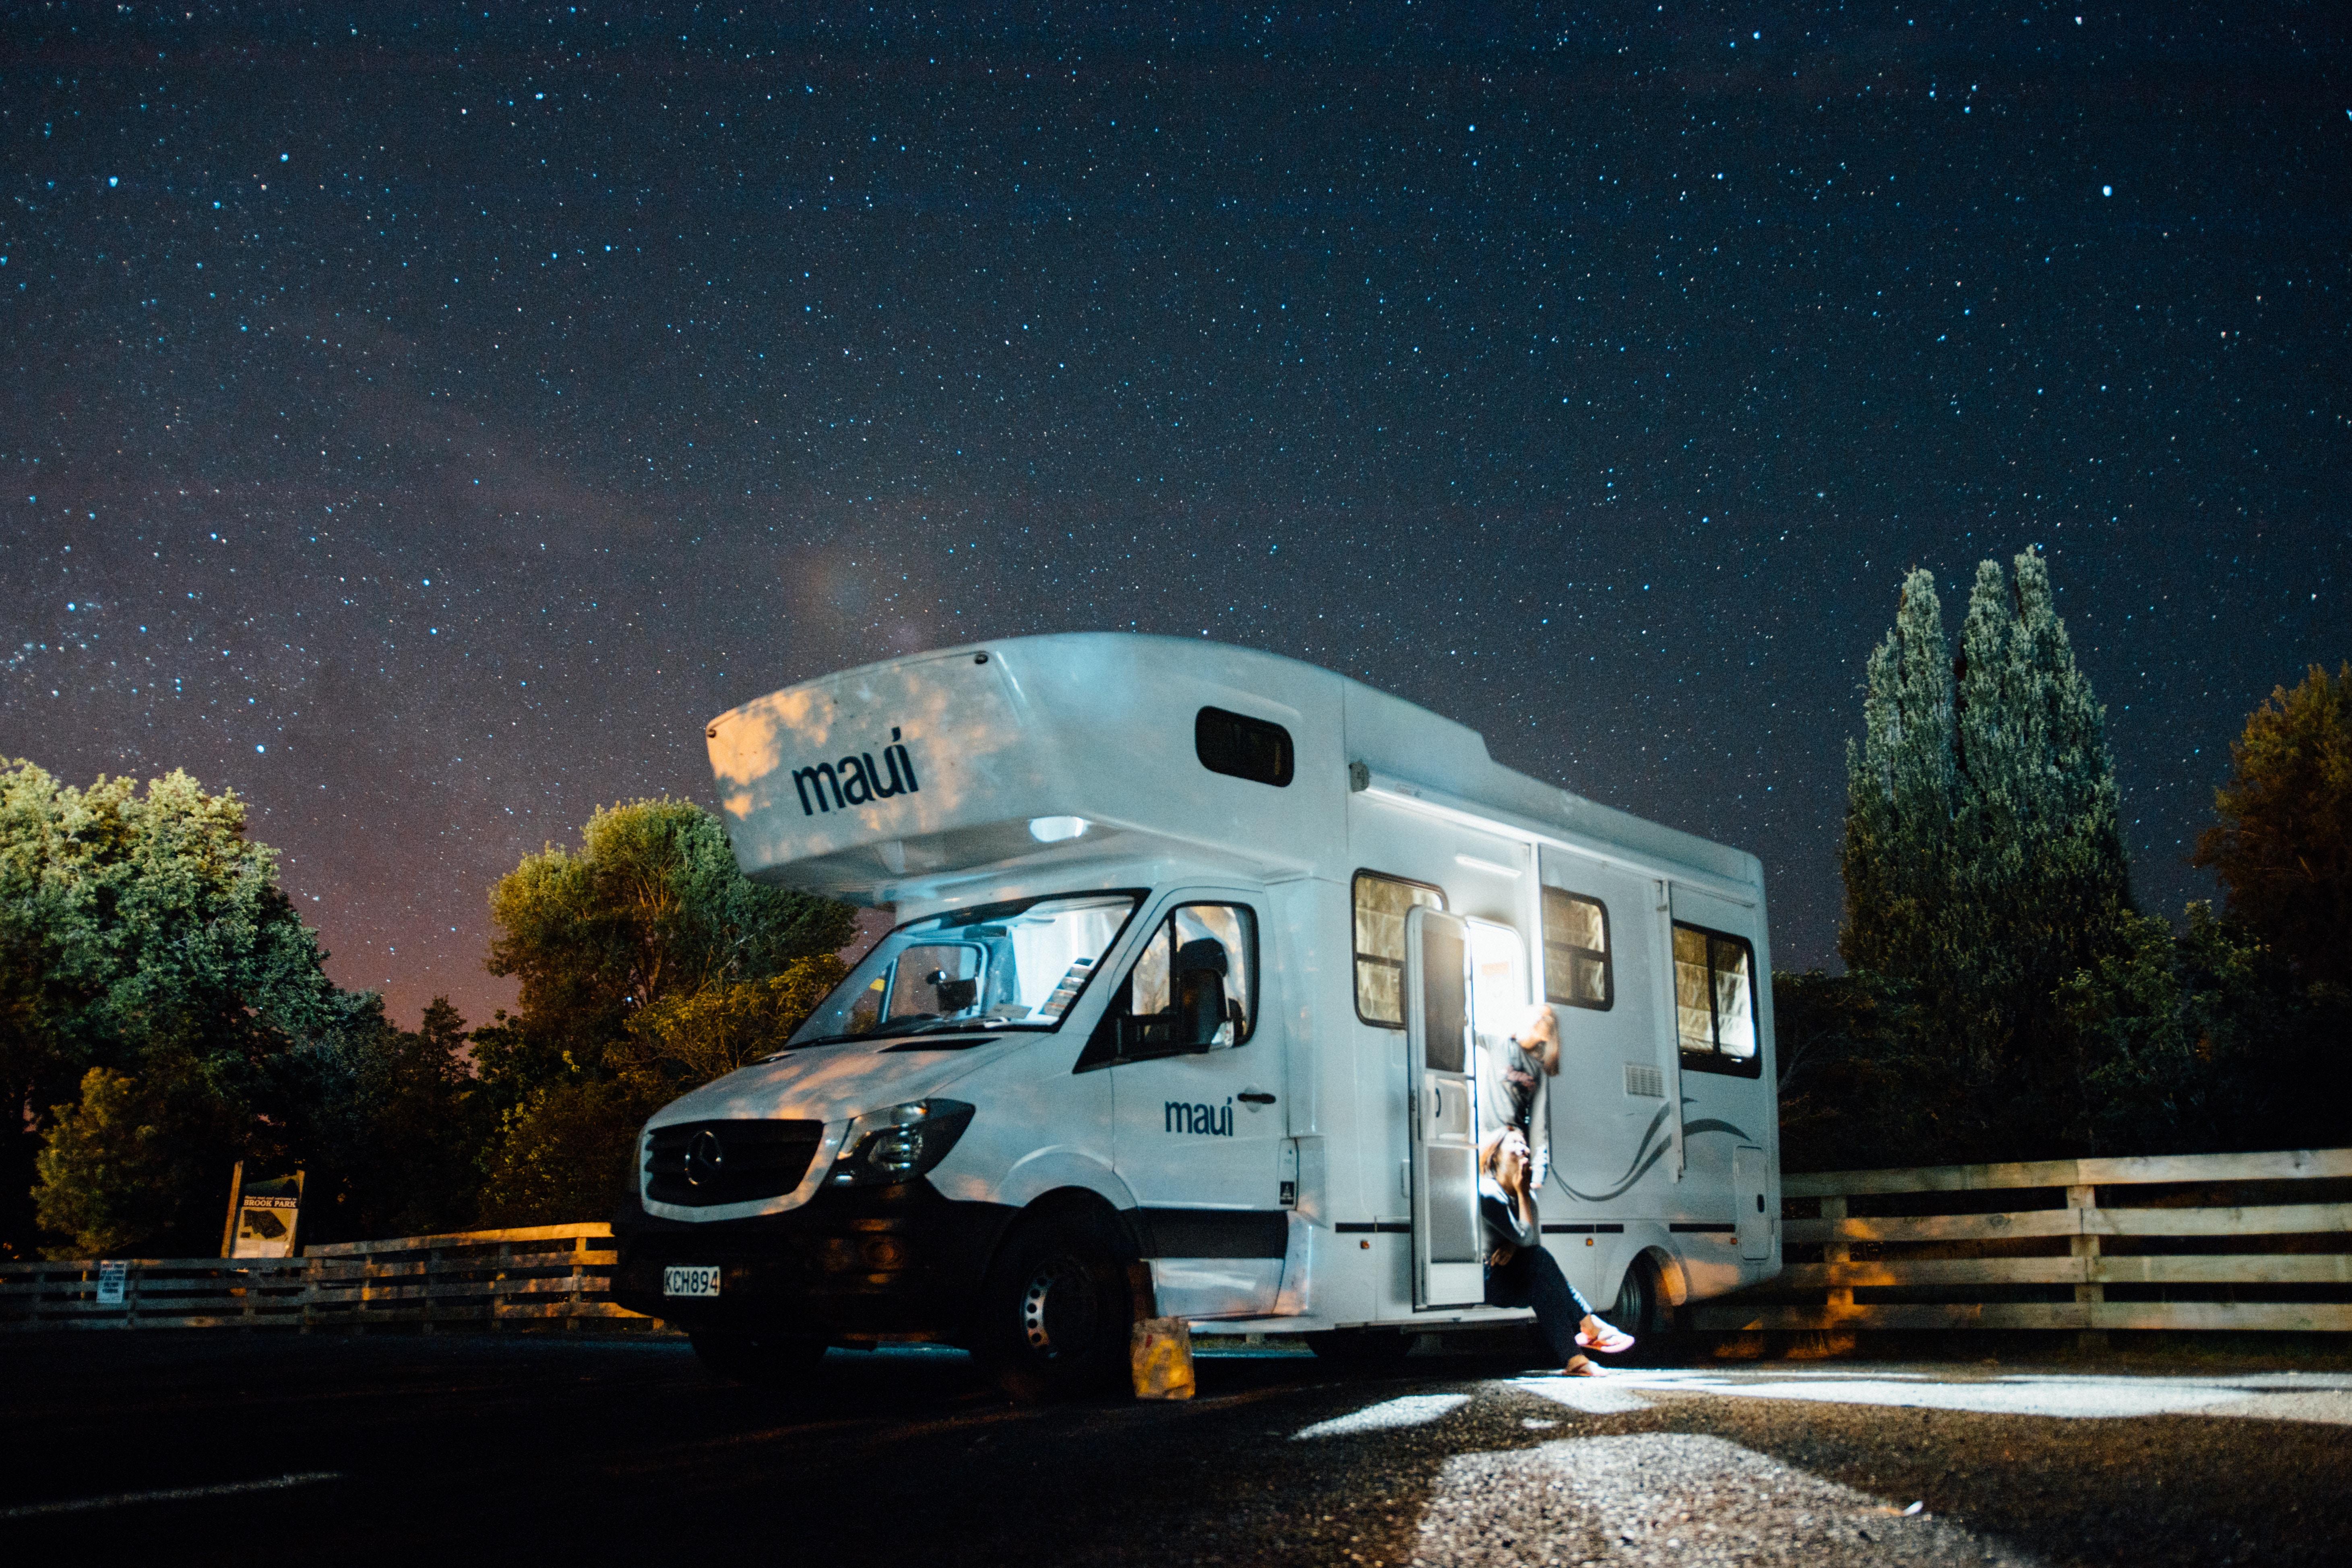 rv park on a starry night